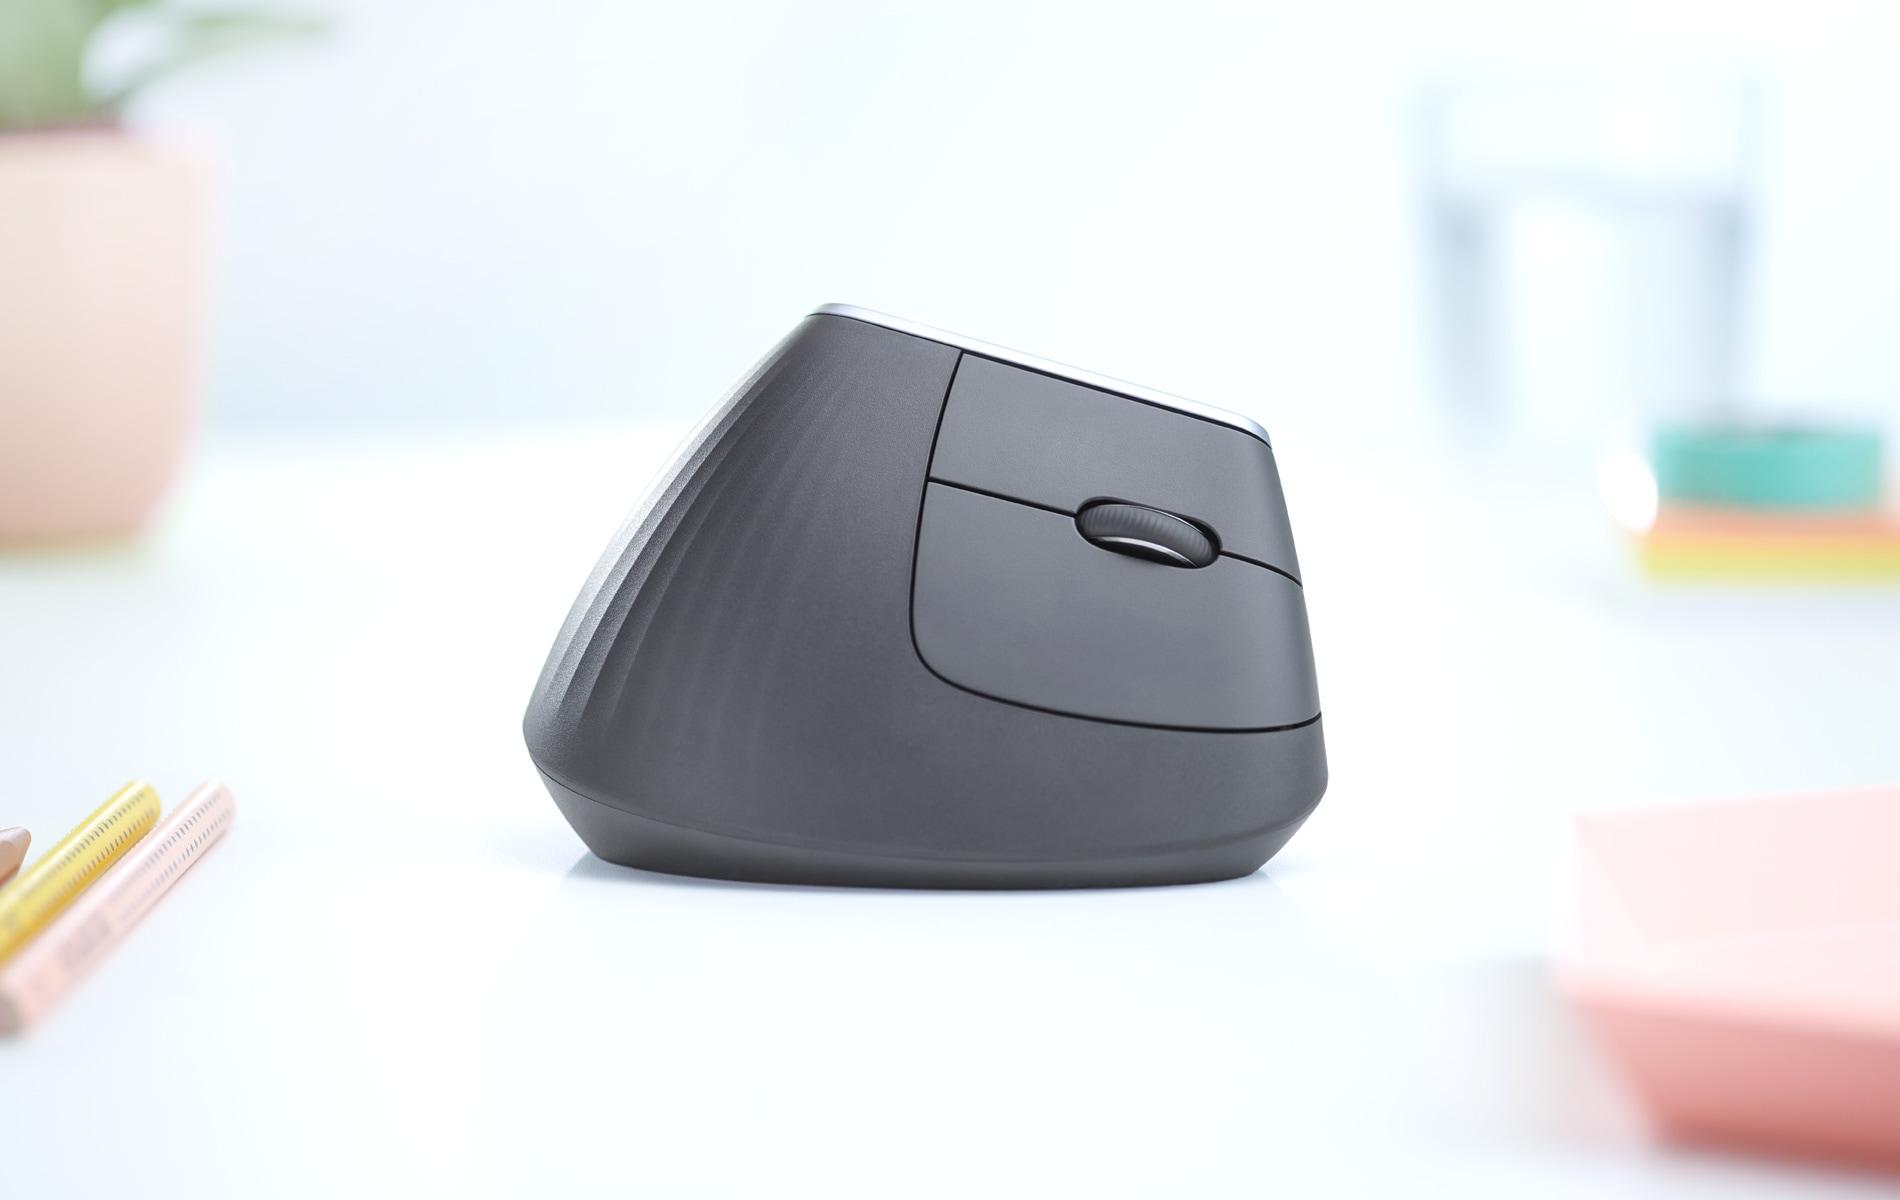 Mouse MX Vertical, da Logitech